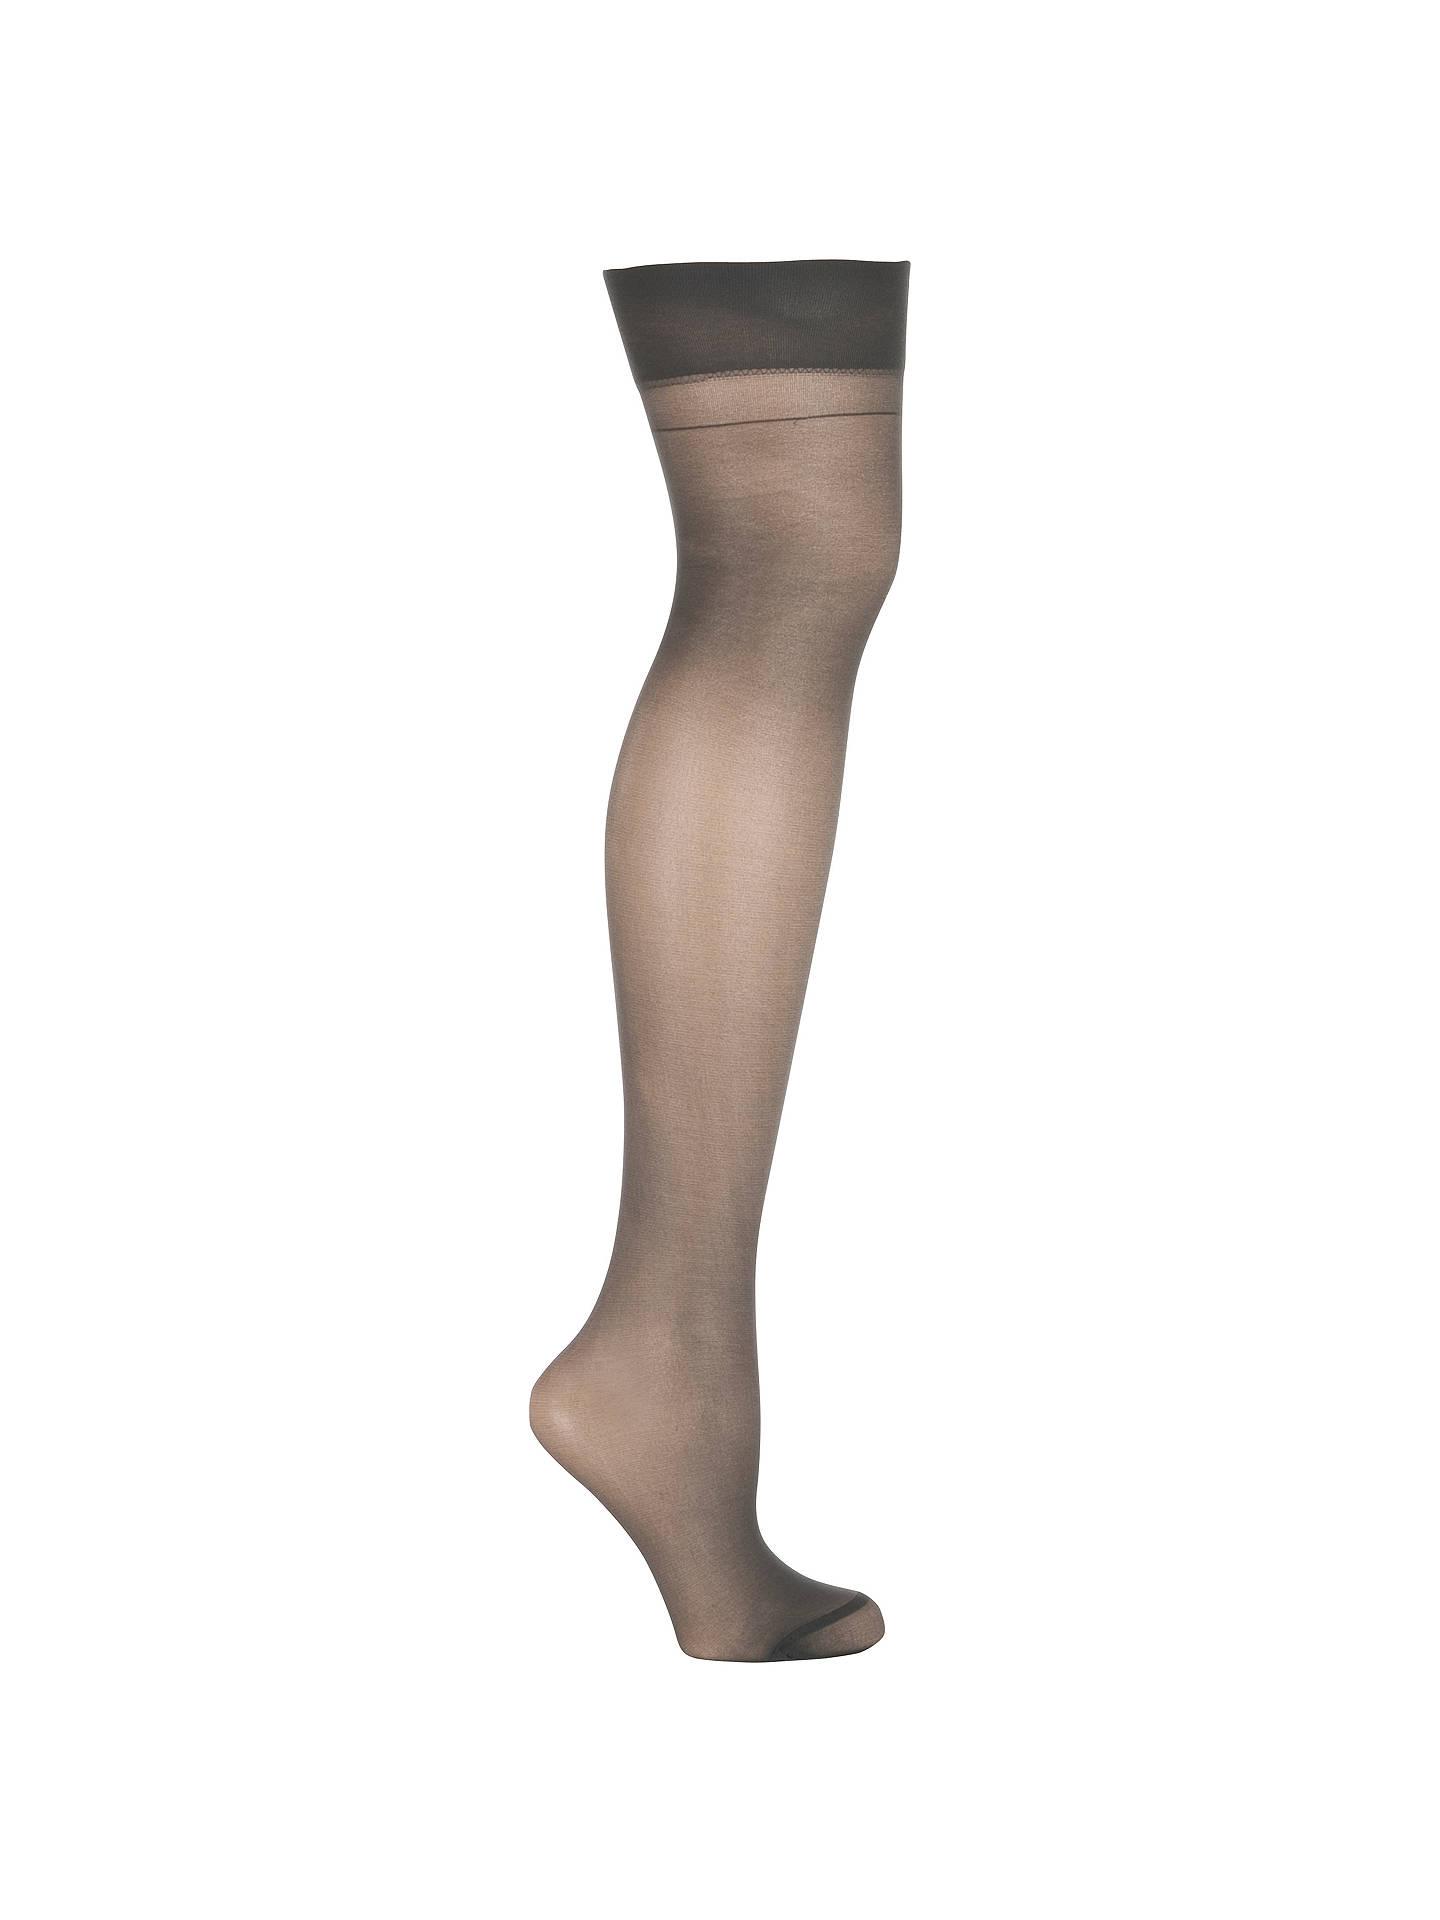 44b9c39f0 ... Buy John Lewis   Partners 15 Denier Sheer Stockings